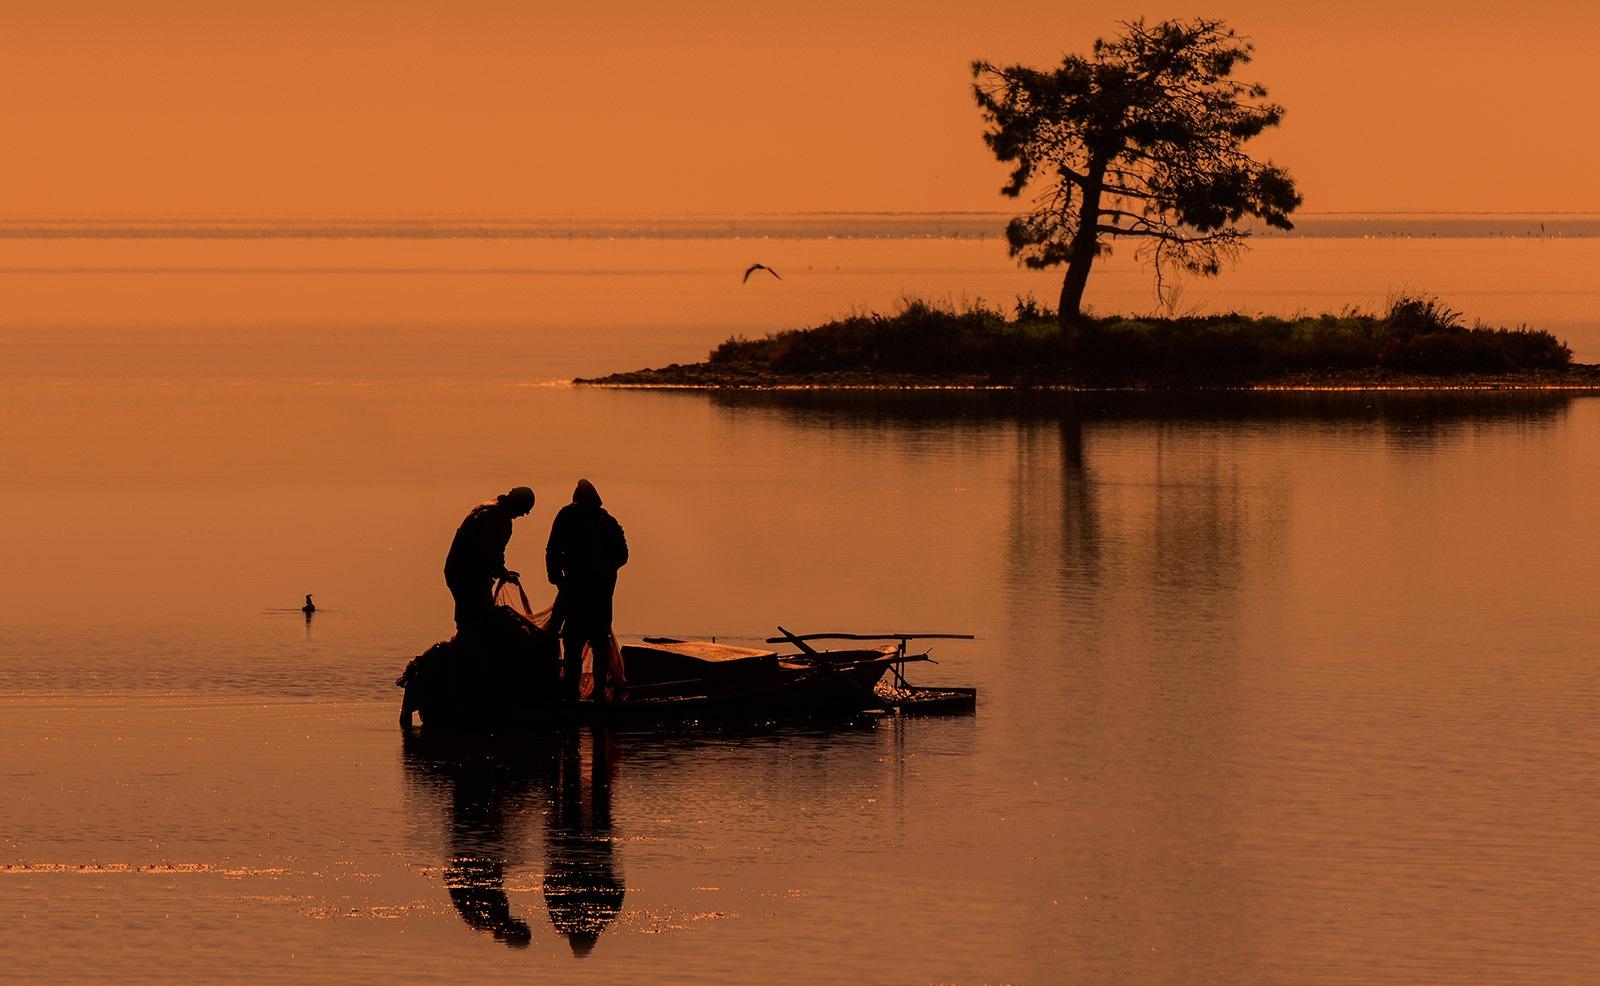 Throwing fishing Net!! by Sotiris Siomis